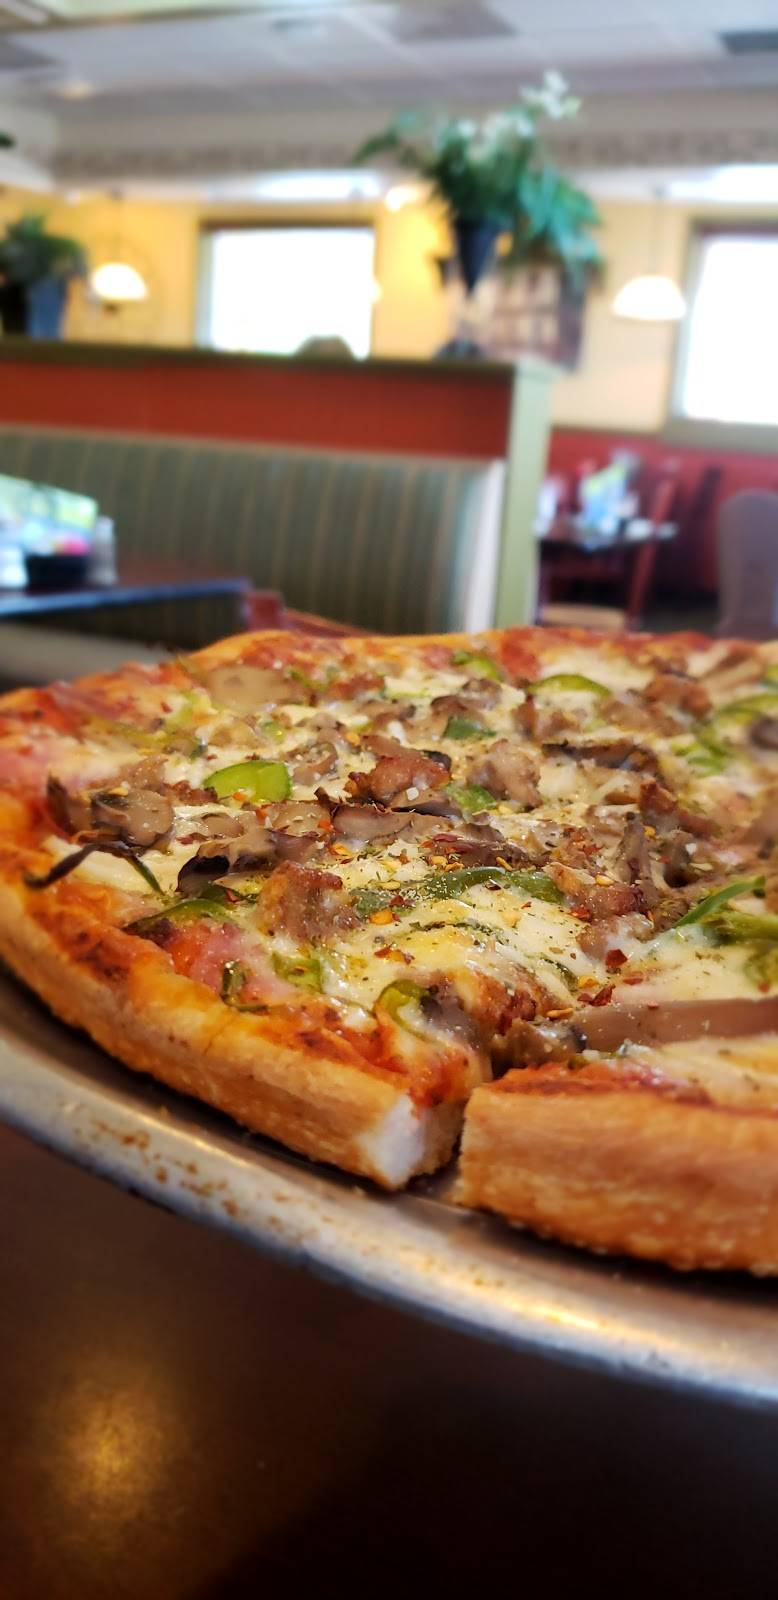 Queens Pizza & Restaurant   restaurant   40949 US Hwy 19 N, Tarpon Springs, FL 34689, USA   7279391791 OR +1 727-939-1791